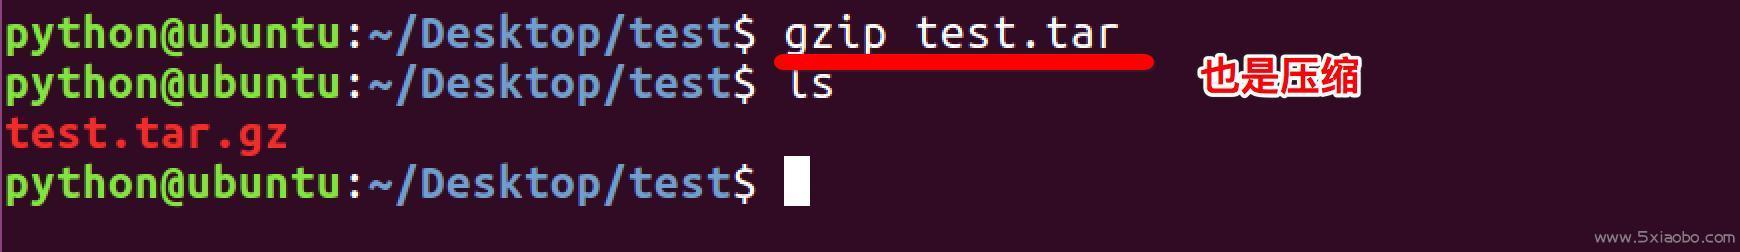 认识Linux命令--文件、磁盘管理  Linux 命令 第36张